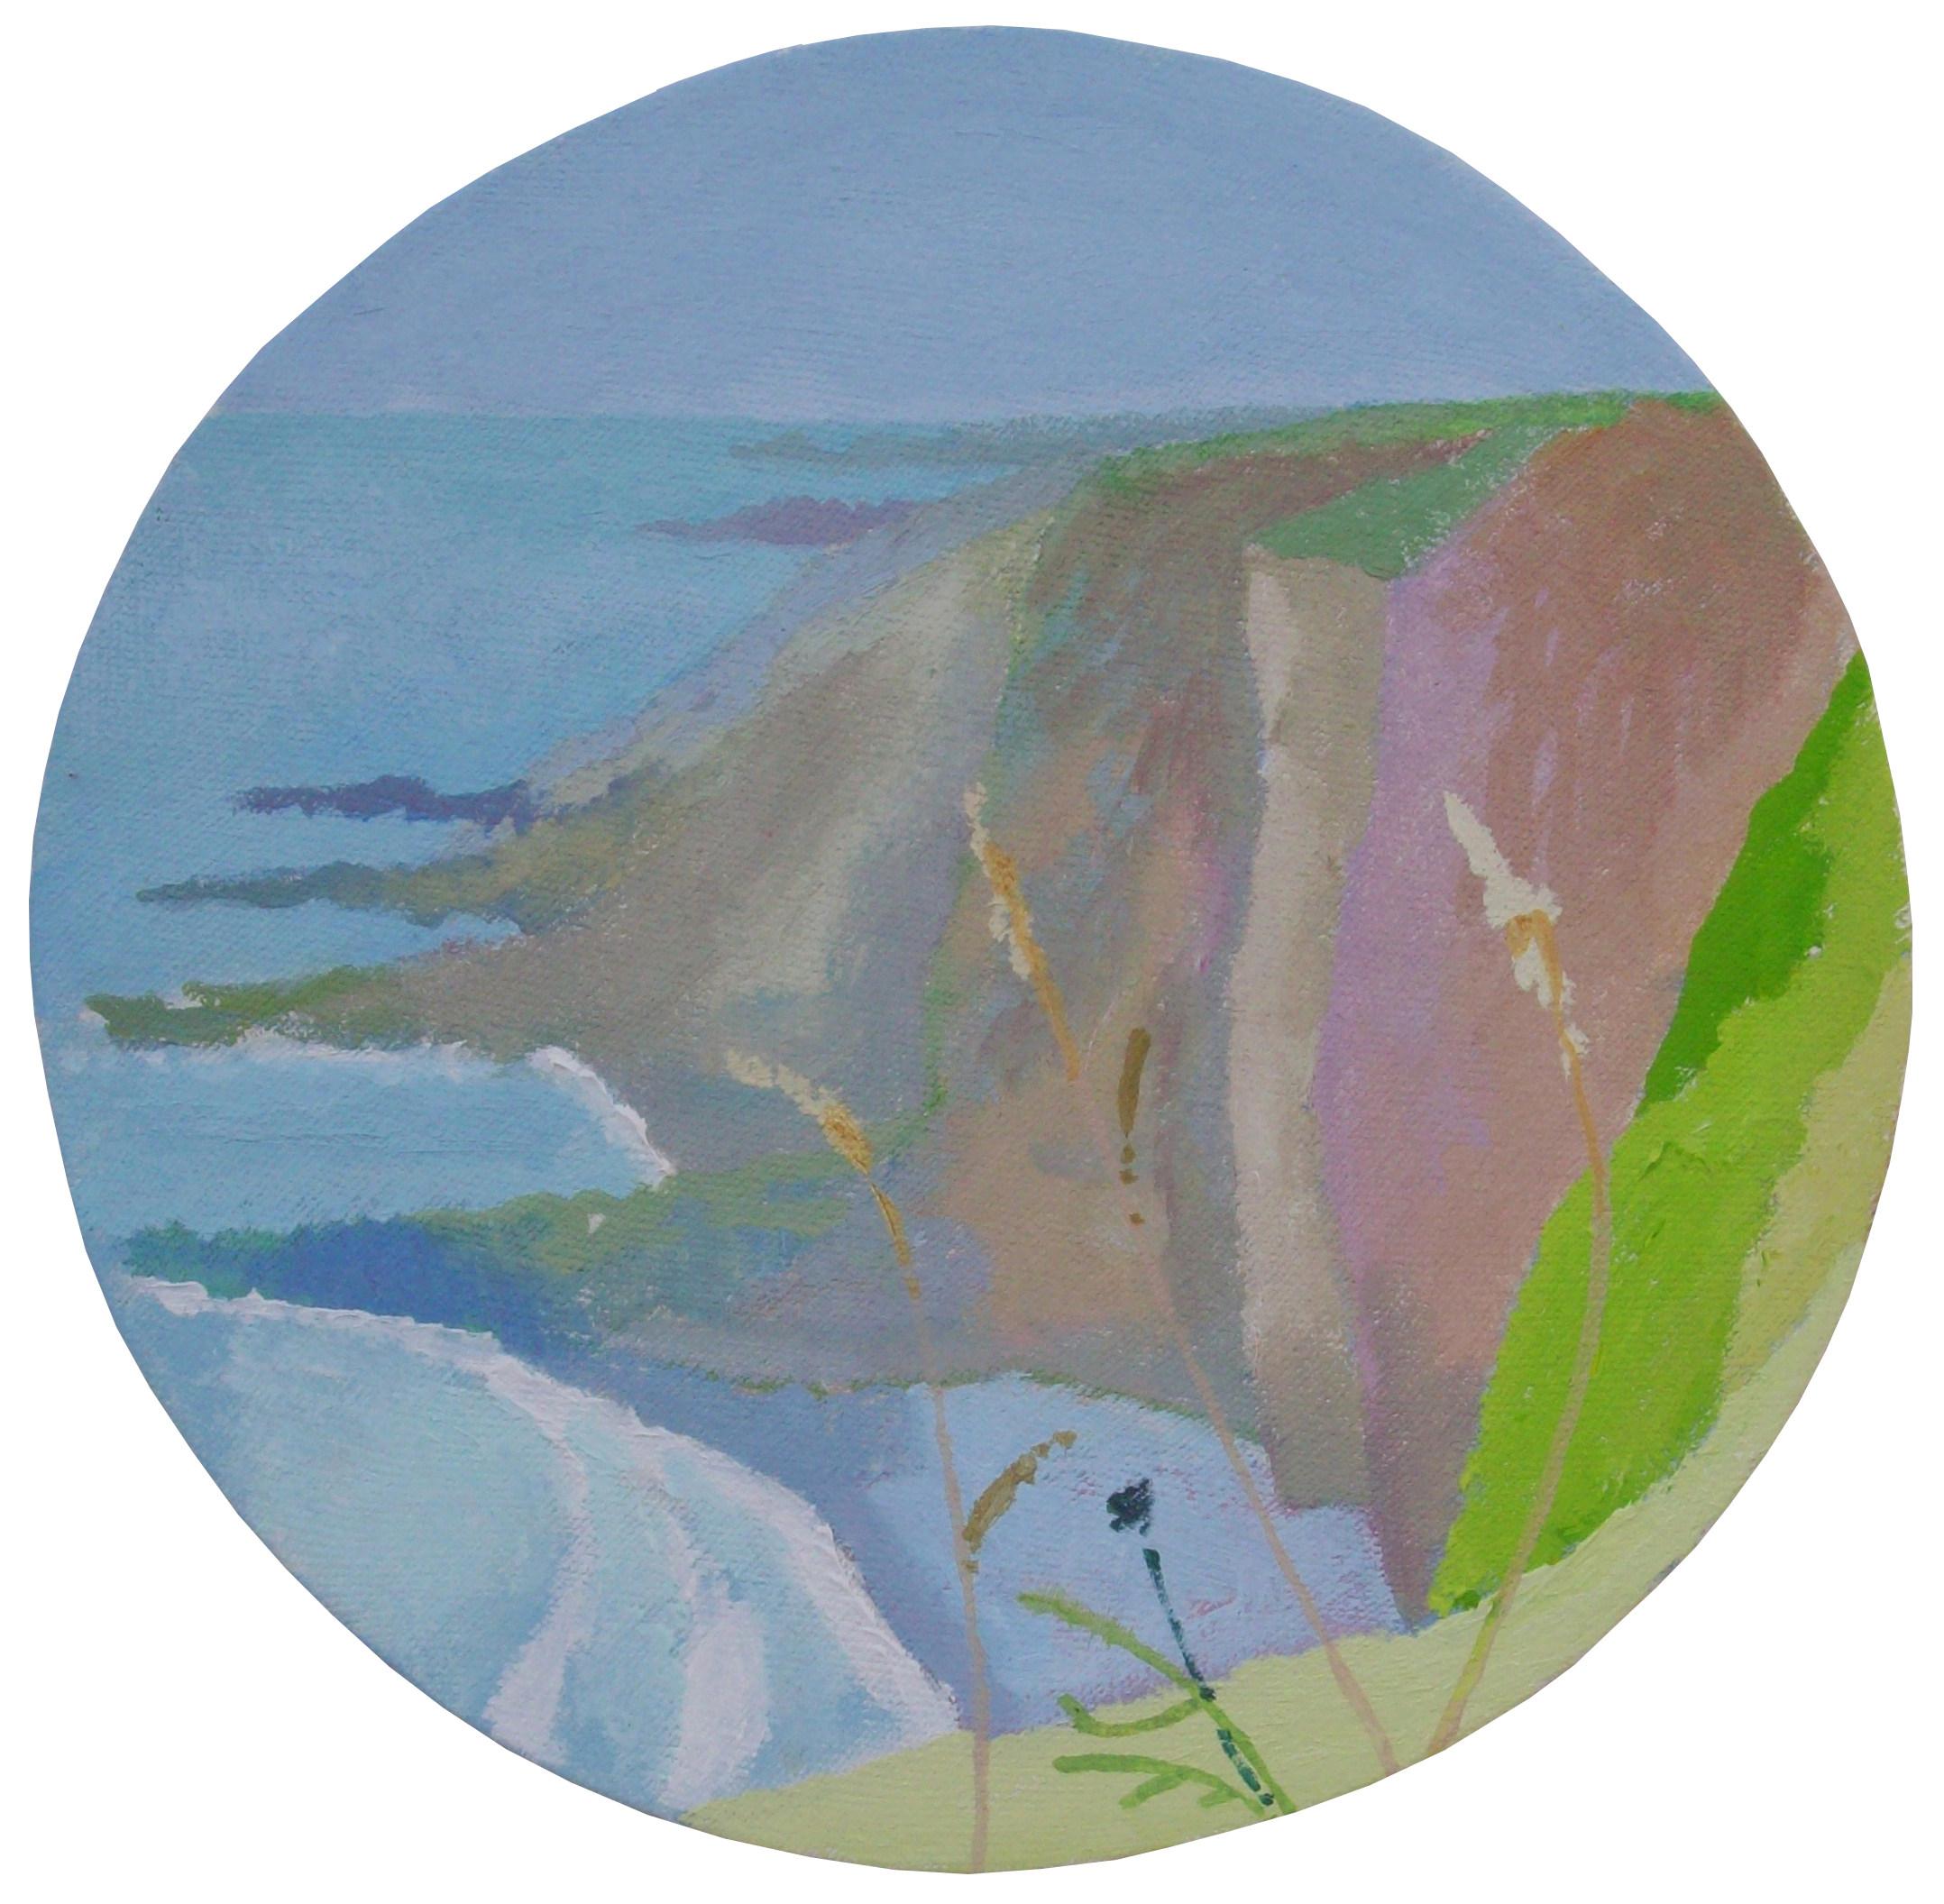 Cliffs 2 14/09/14